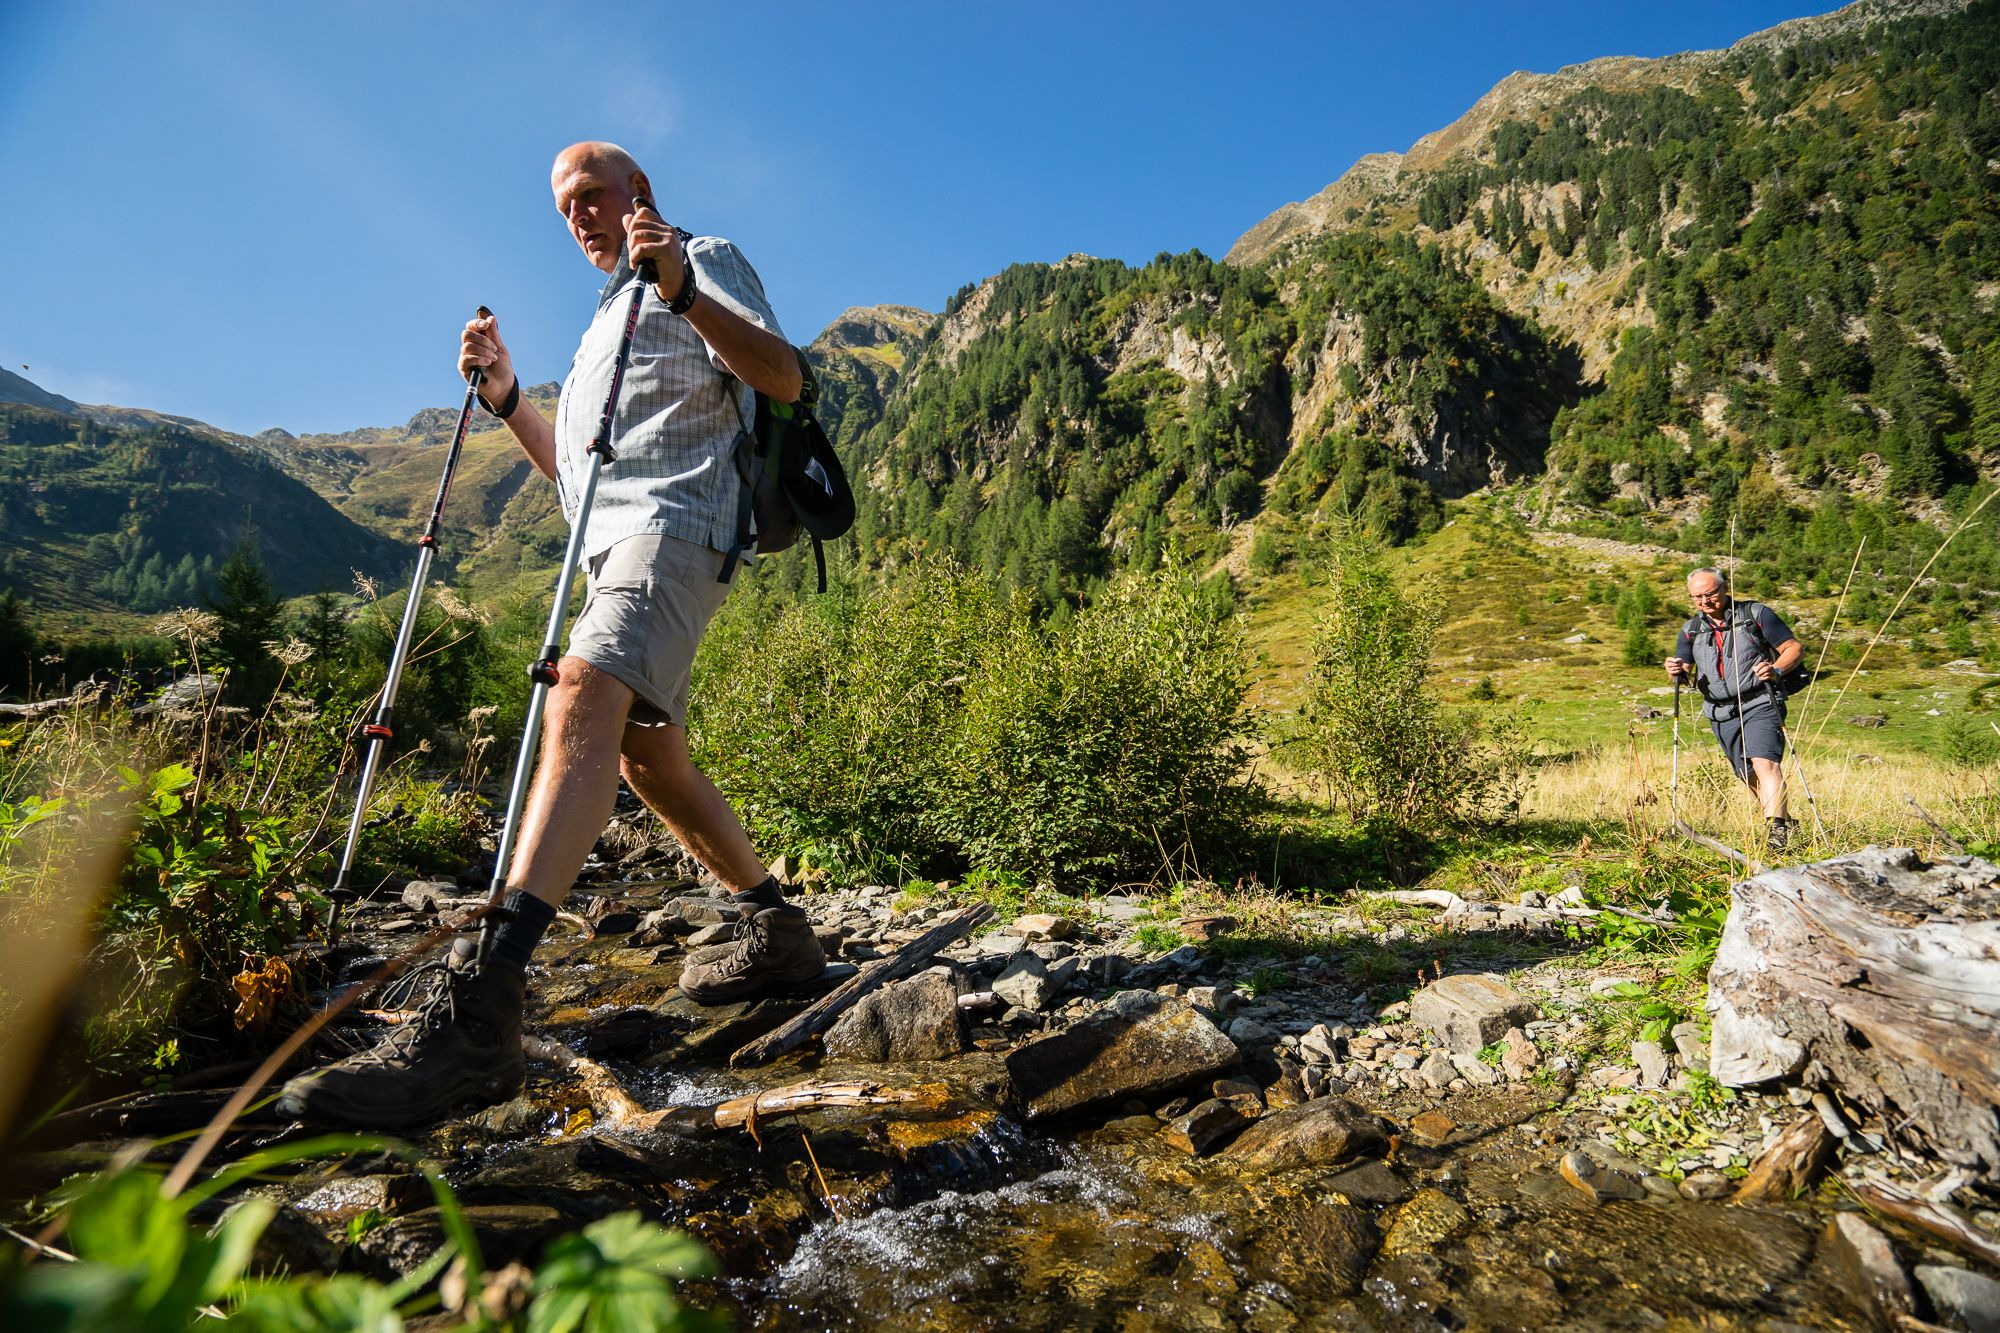 Wanderung zur Pernfiechtalm